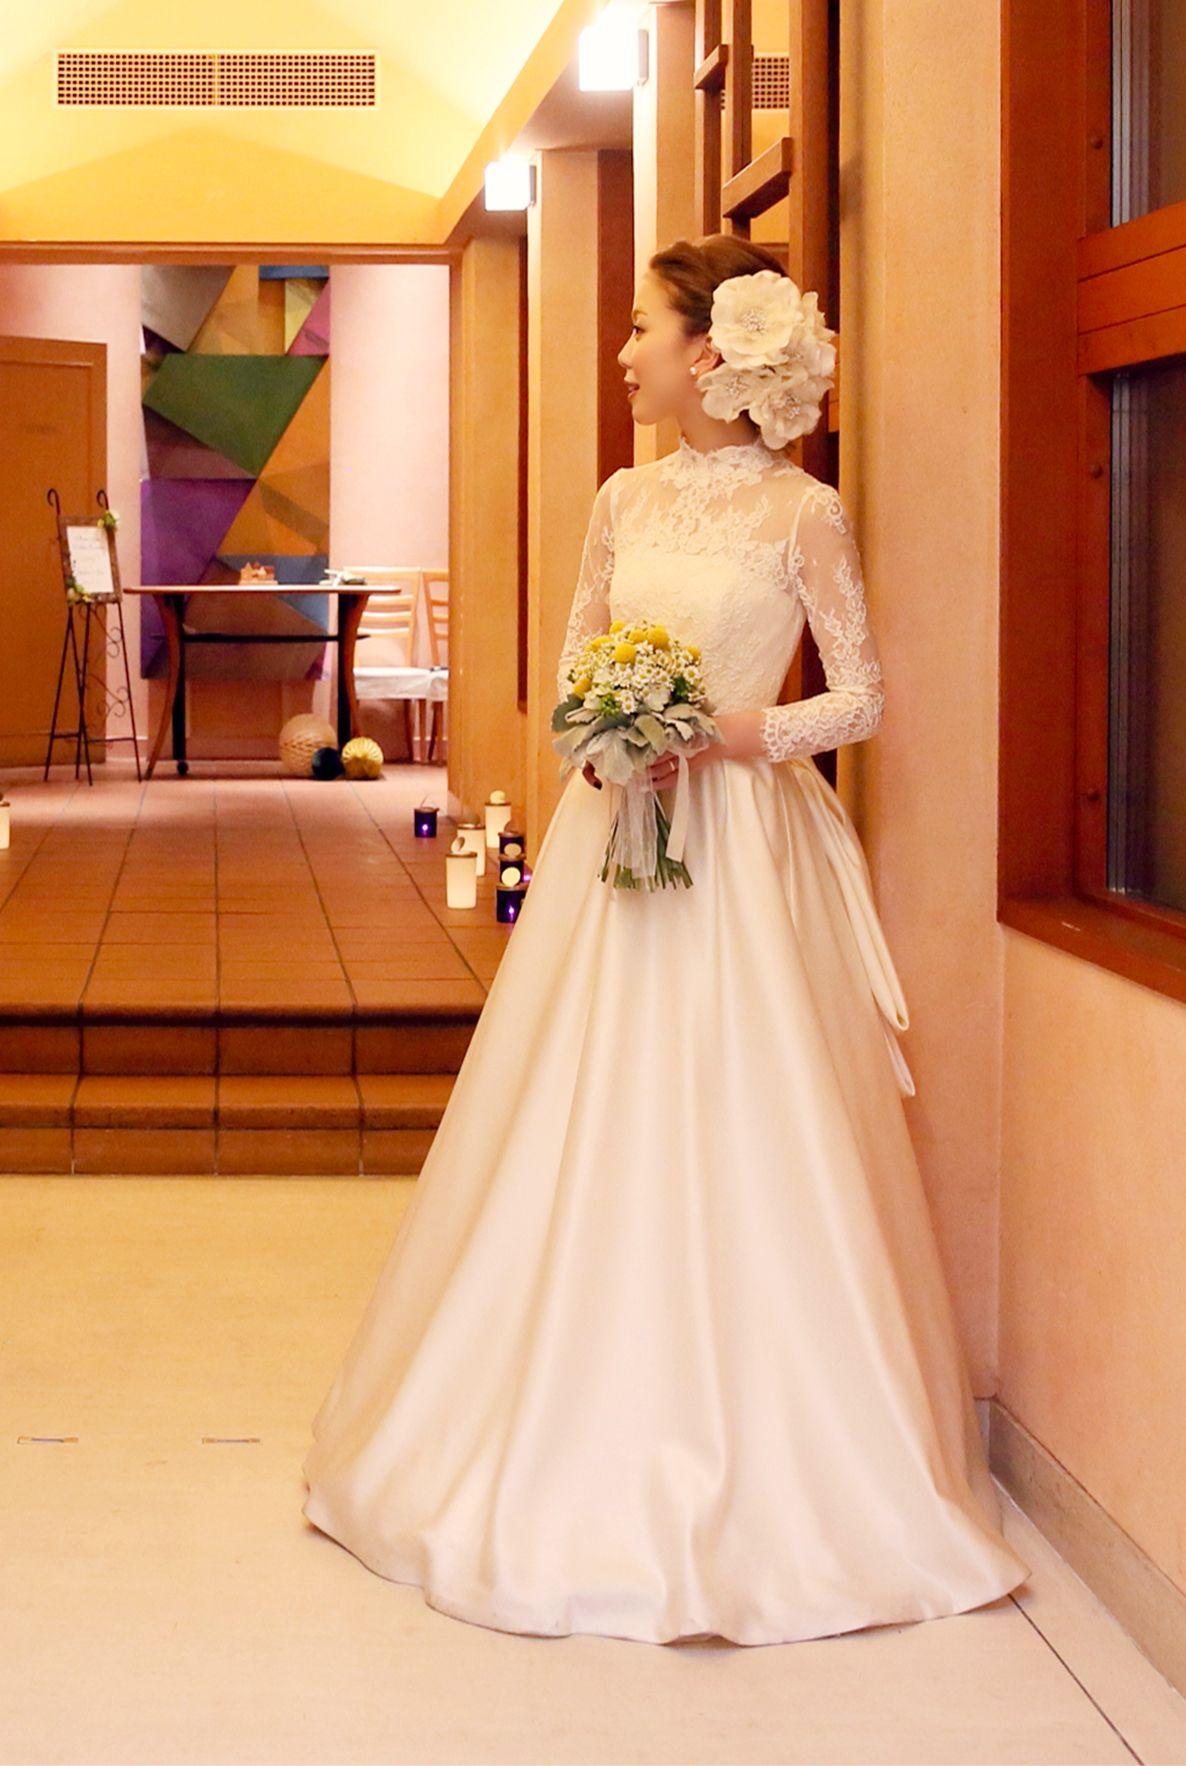 d3a13b1b76fac 軽井沢高原教会にてご結婚式♪ アーネラクロージングの素敵な花嫁様 ...